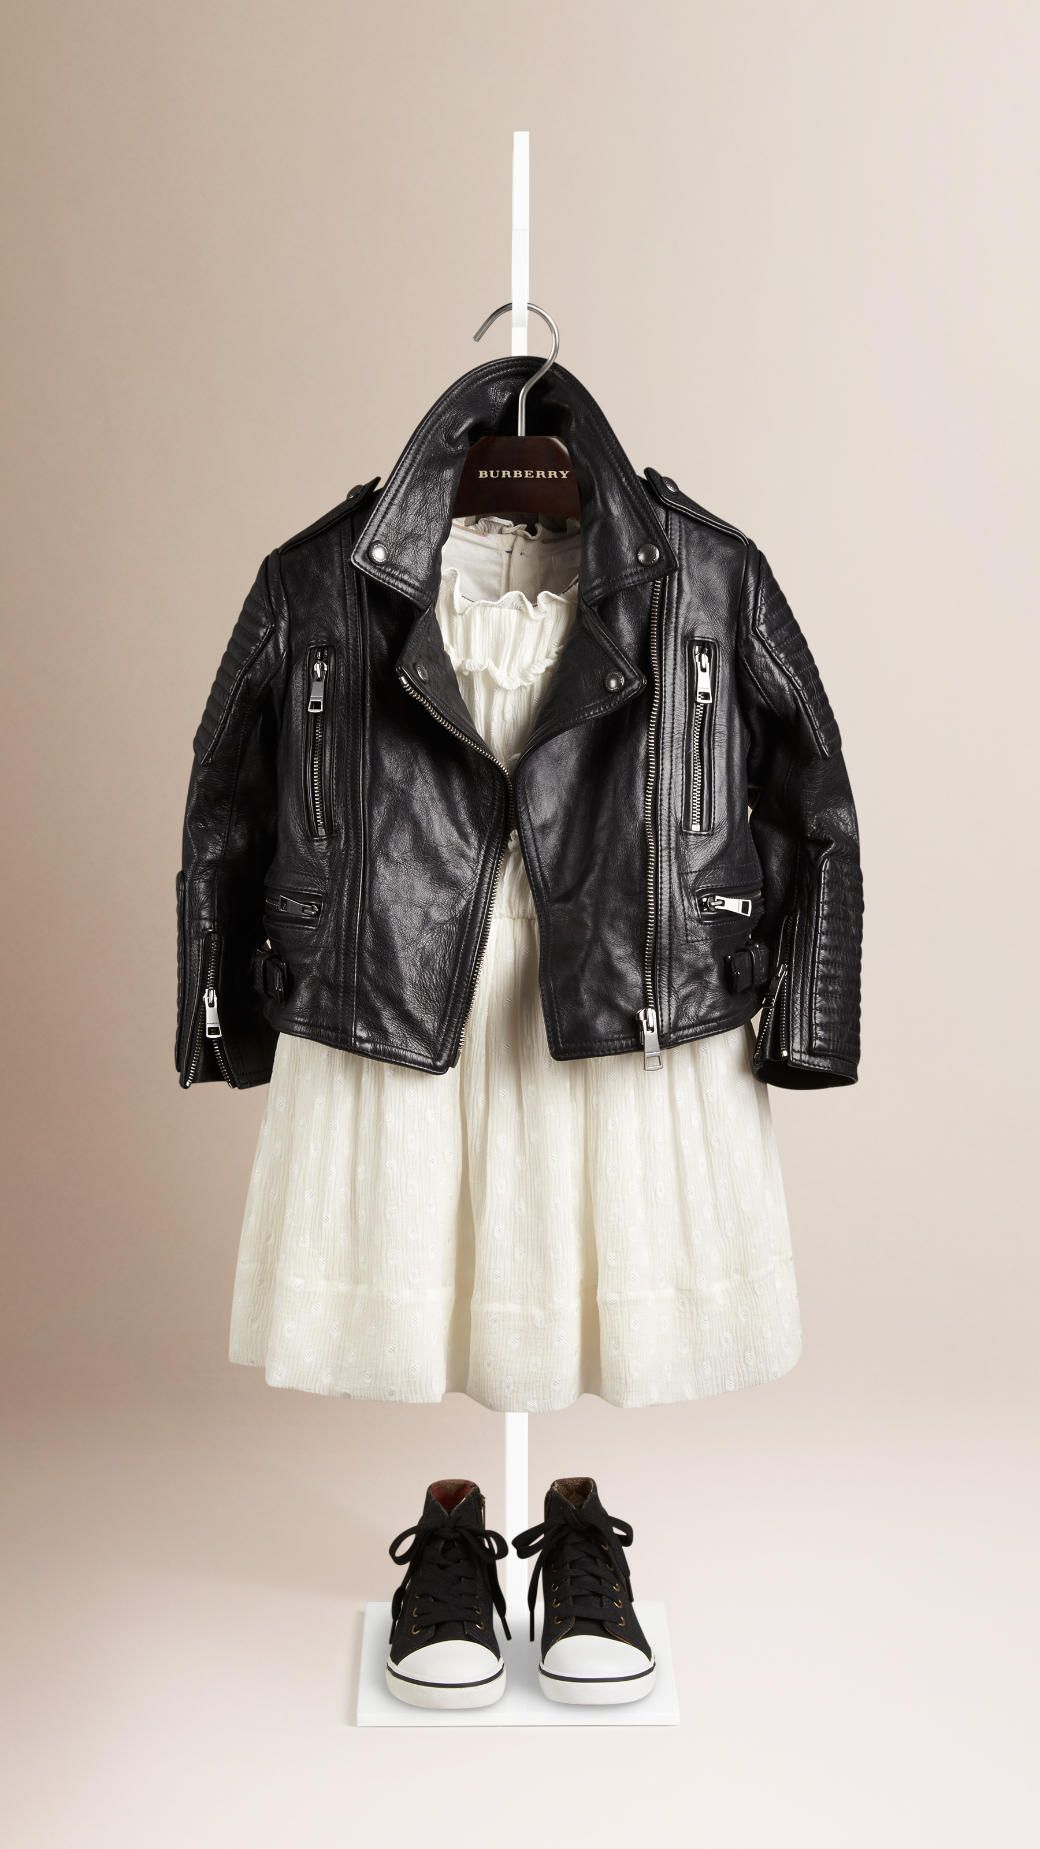 Leather Biker Jacket   Burberry   Kids Fashion  the Kidswear.   Kids ... 476b85dbf5ee